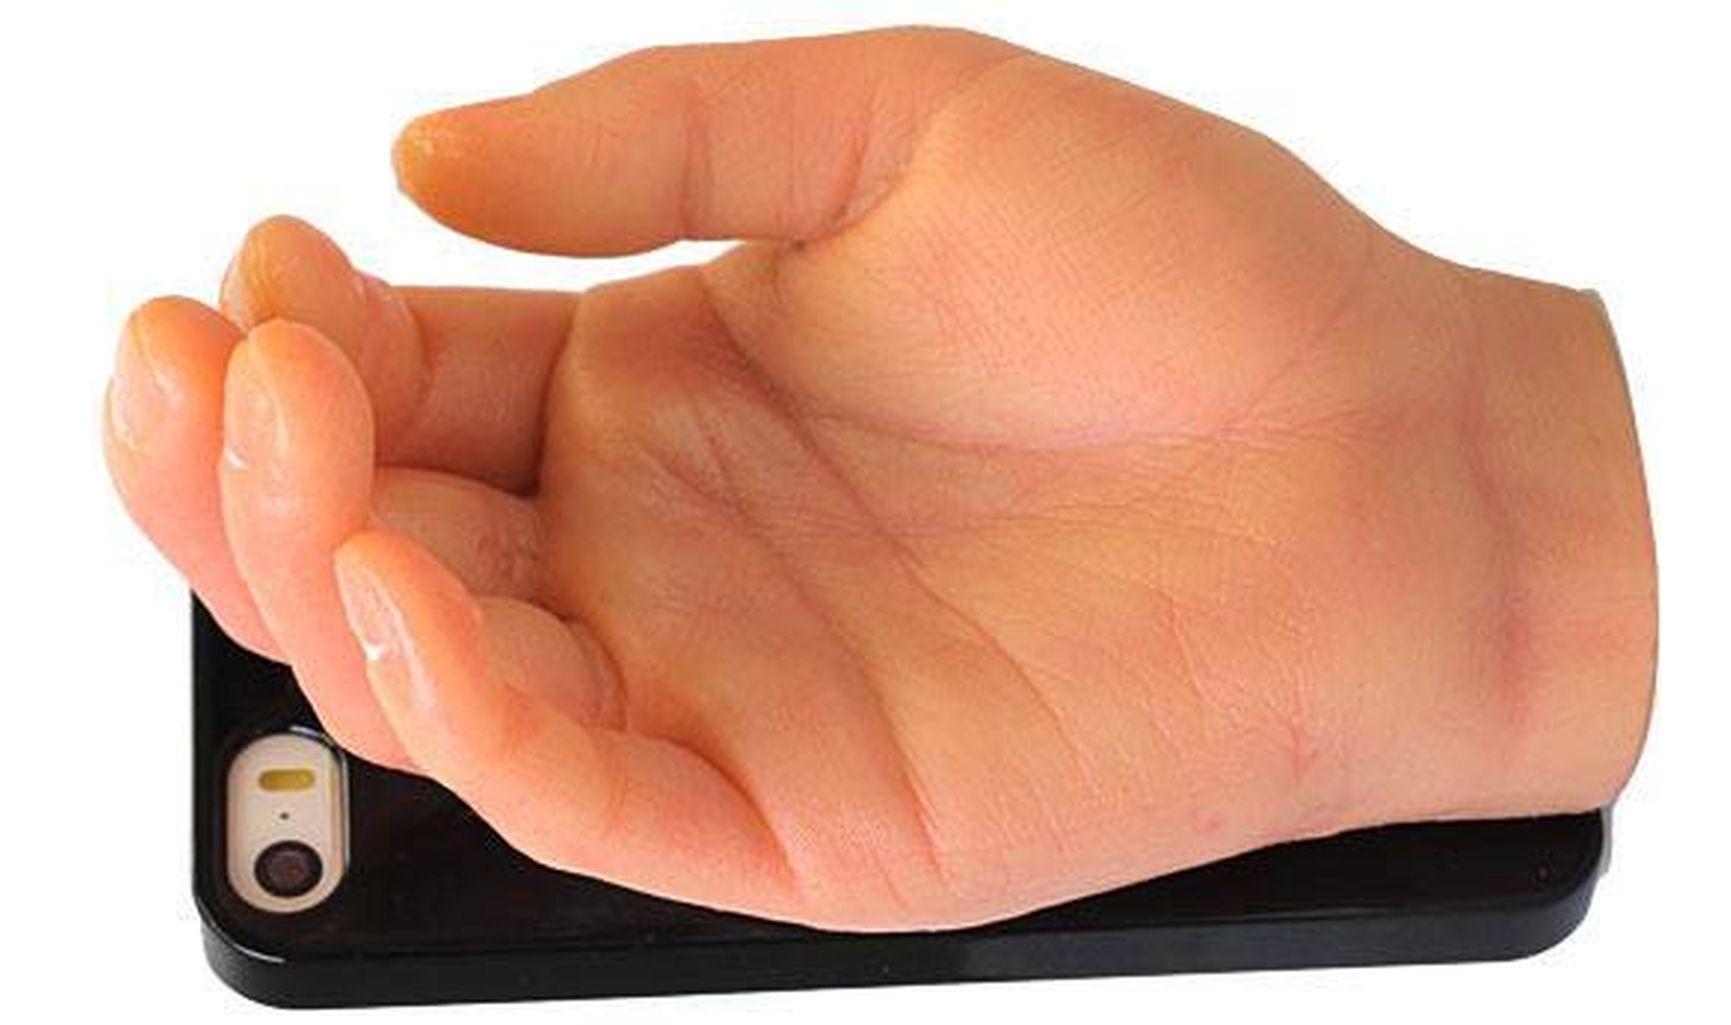 Worst smartphone accessories